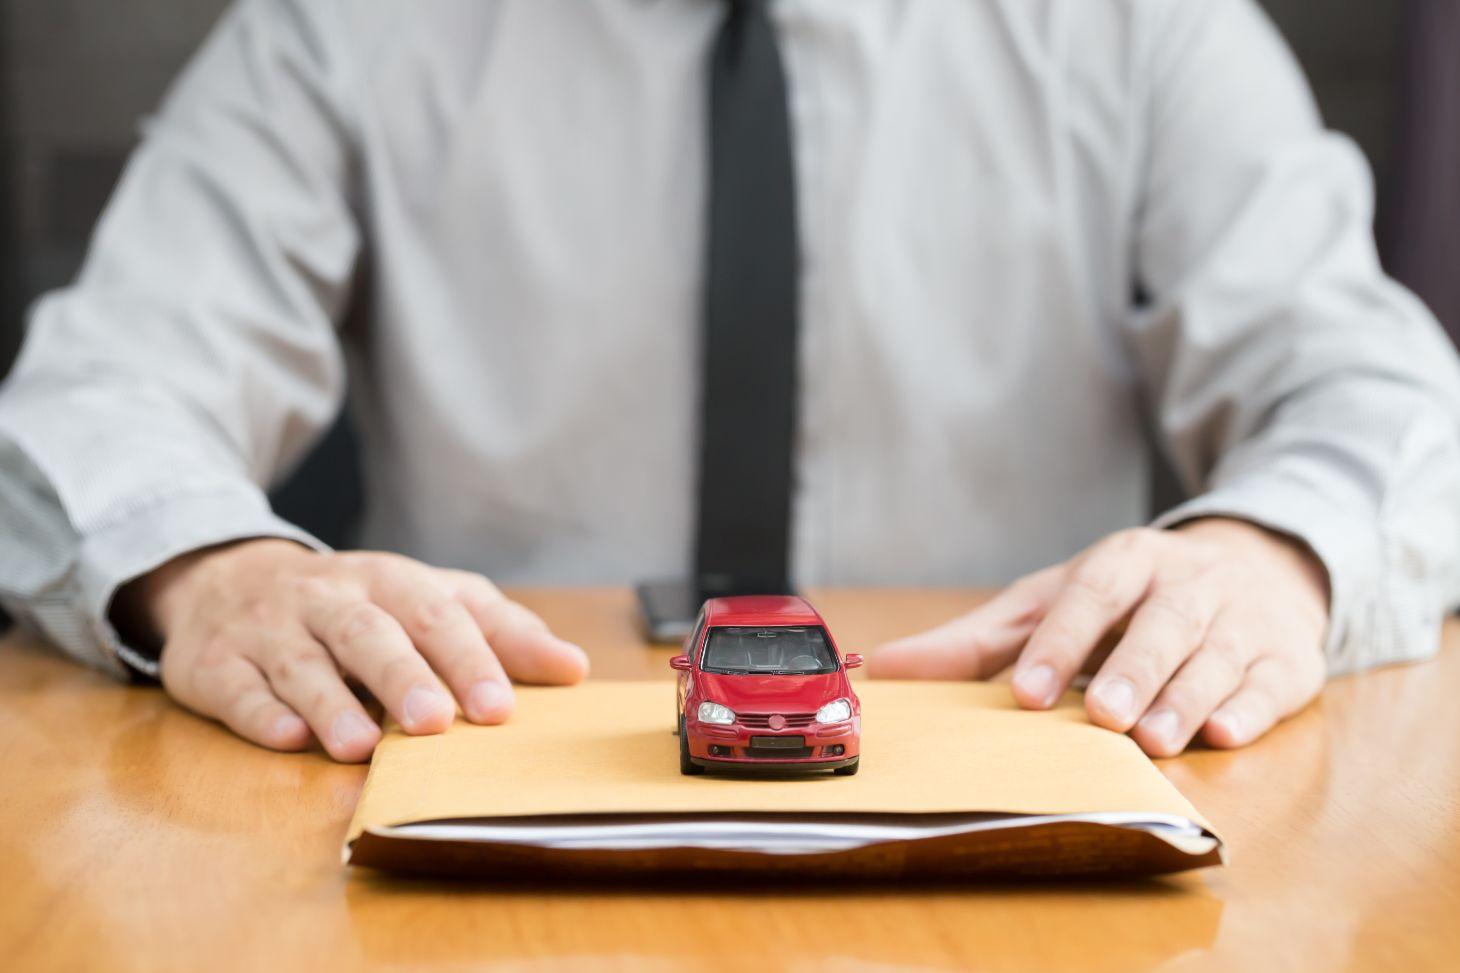 shutterstock apolice seguro auto documentos carro homem gravata camisa social